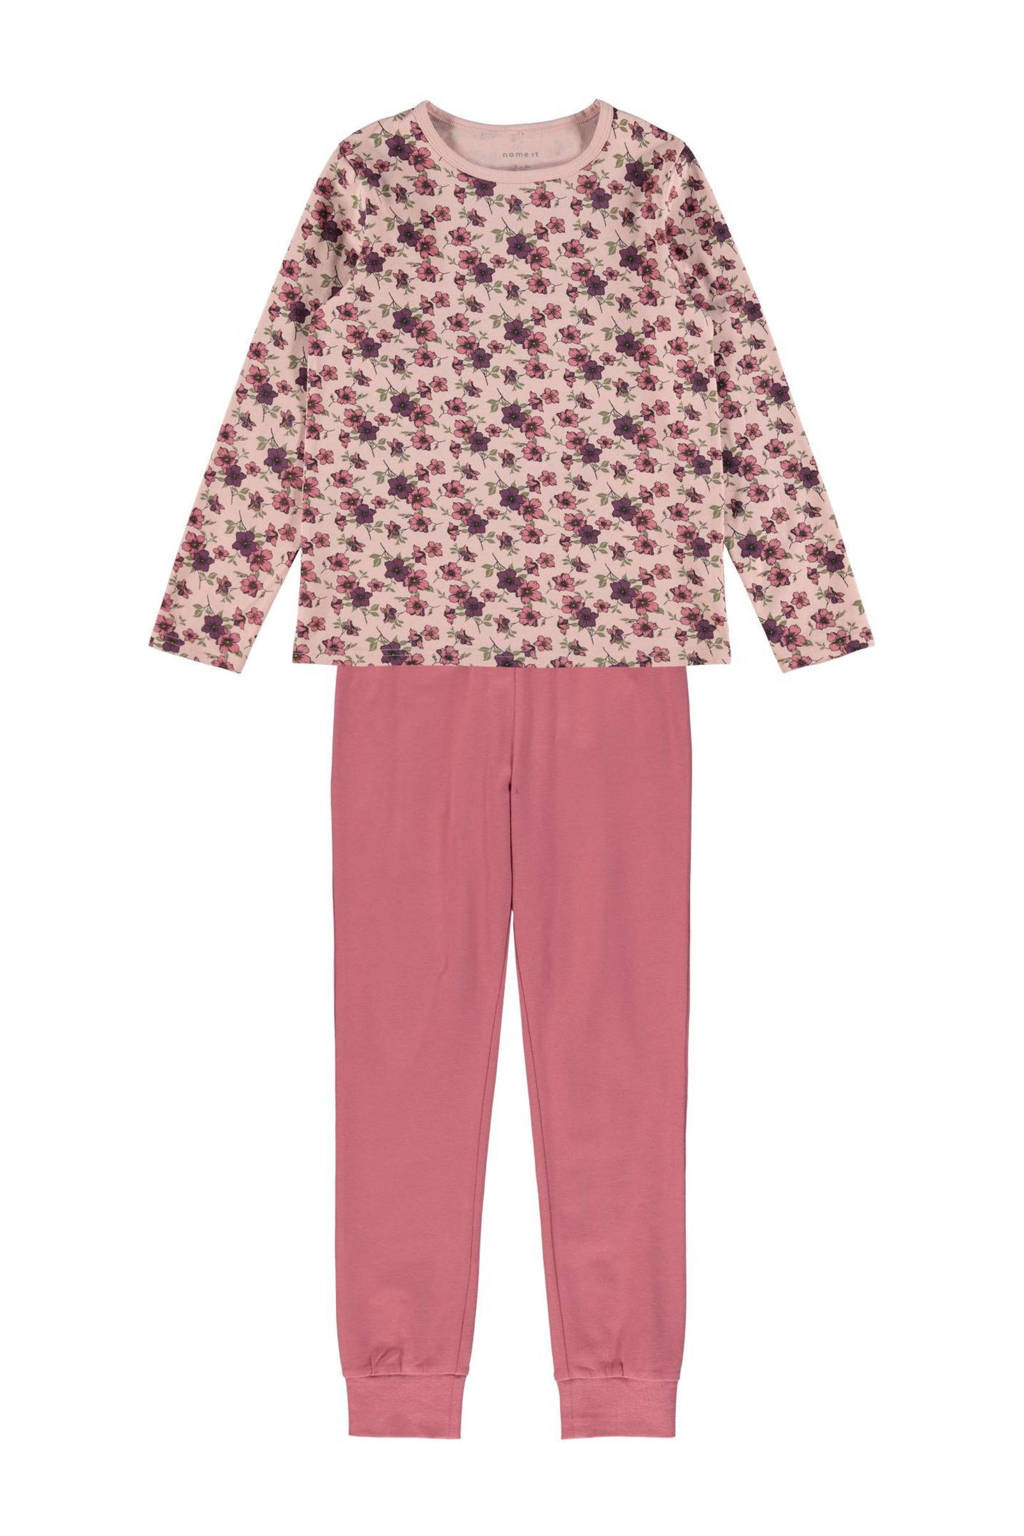 NAME IT KIDS pyjama roze/lichtroze, Roze/lichtroze